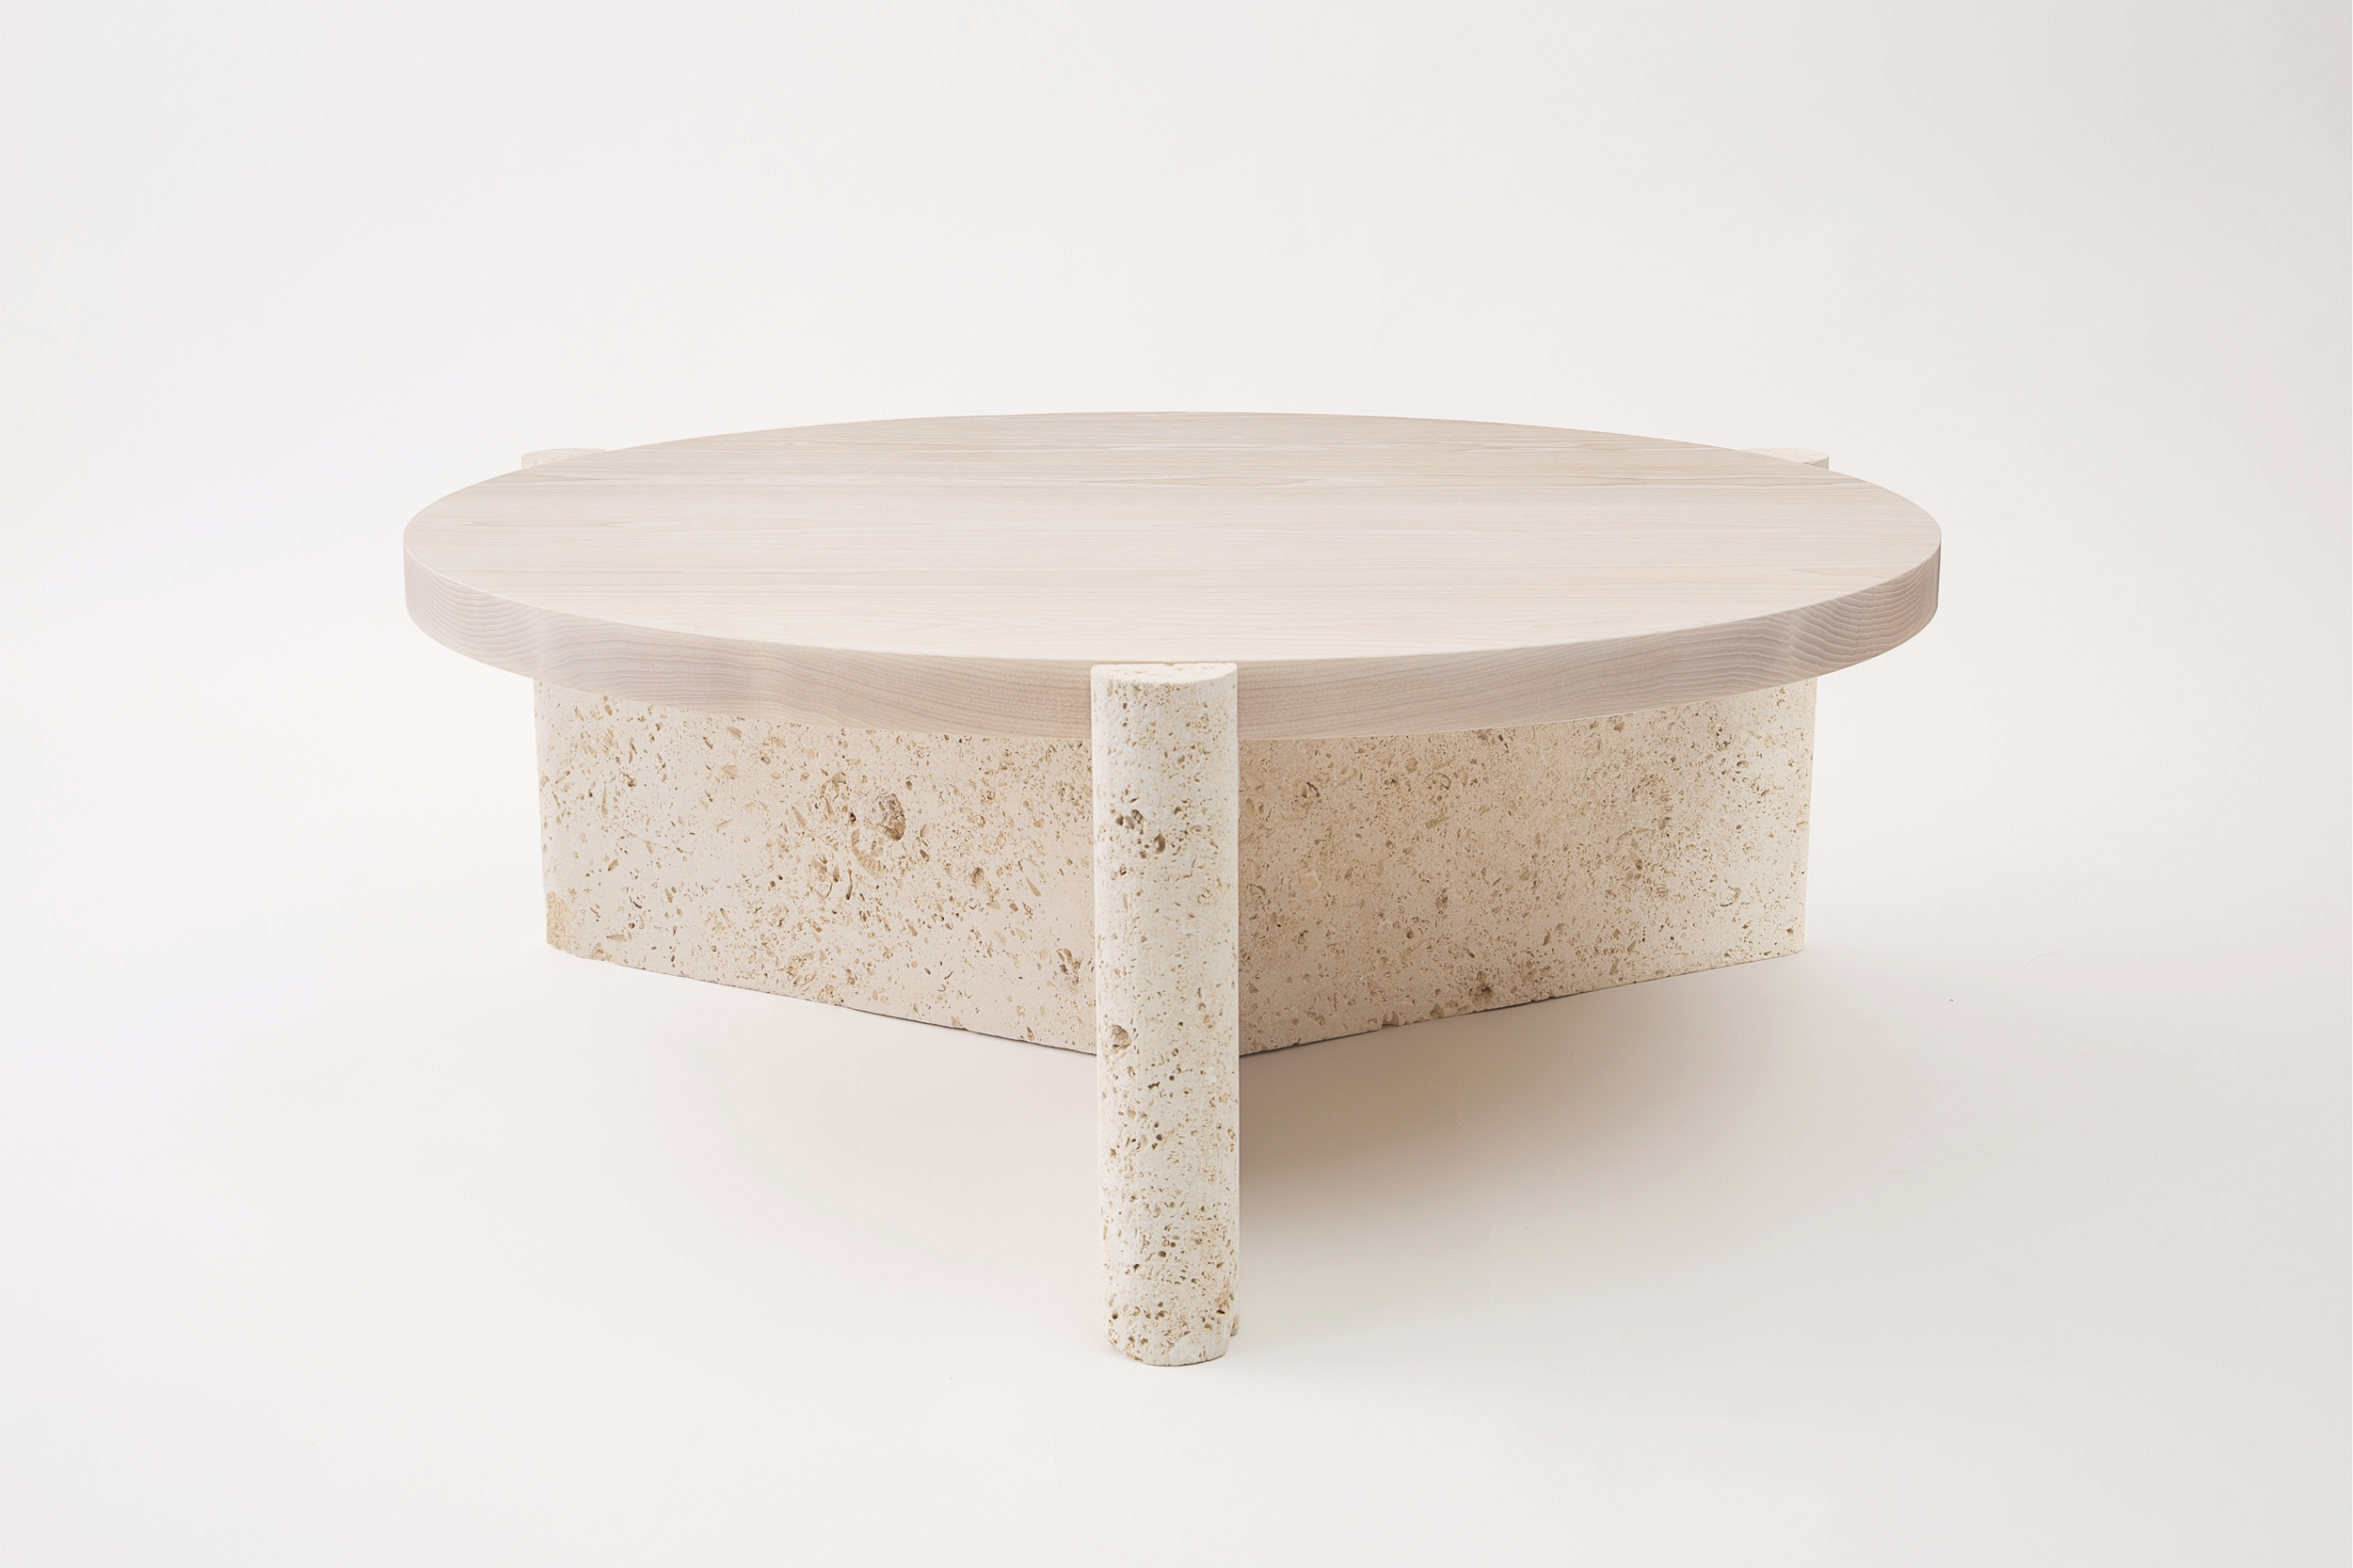 YUCCASTUFF_CONCHO TABLE_VIEW 001.jpg